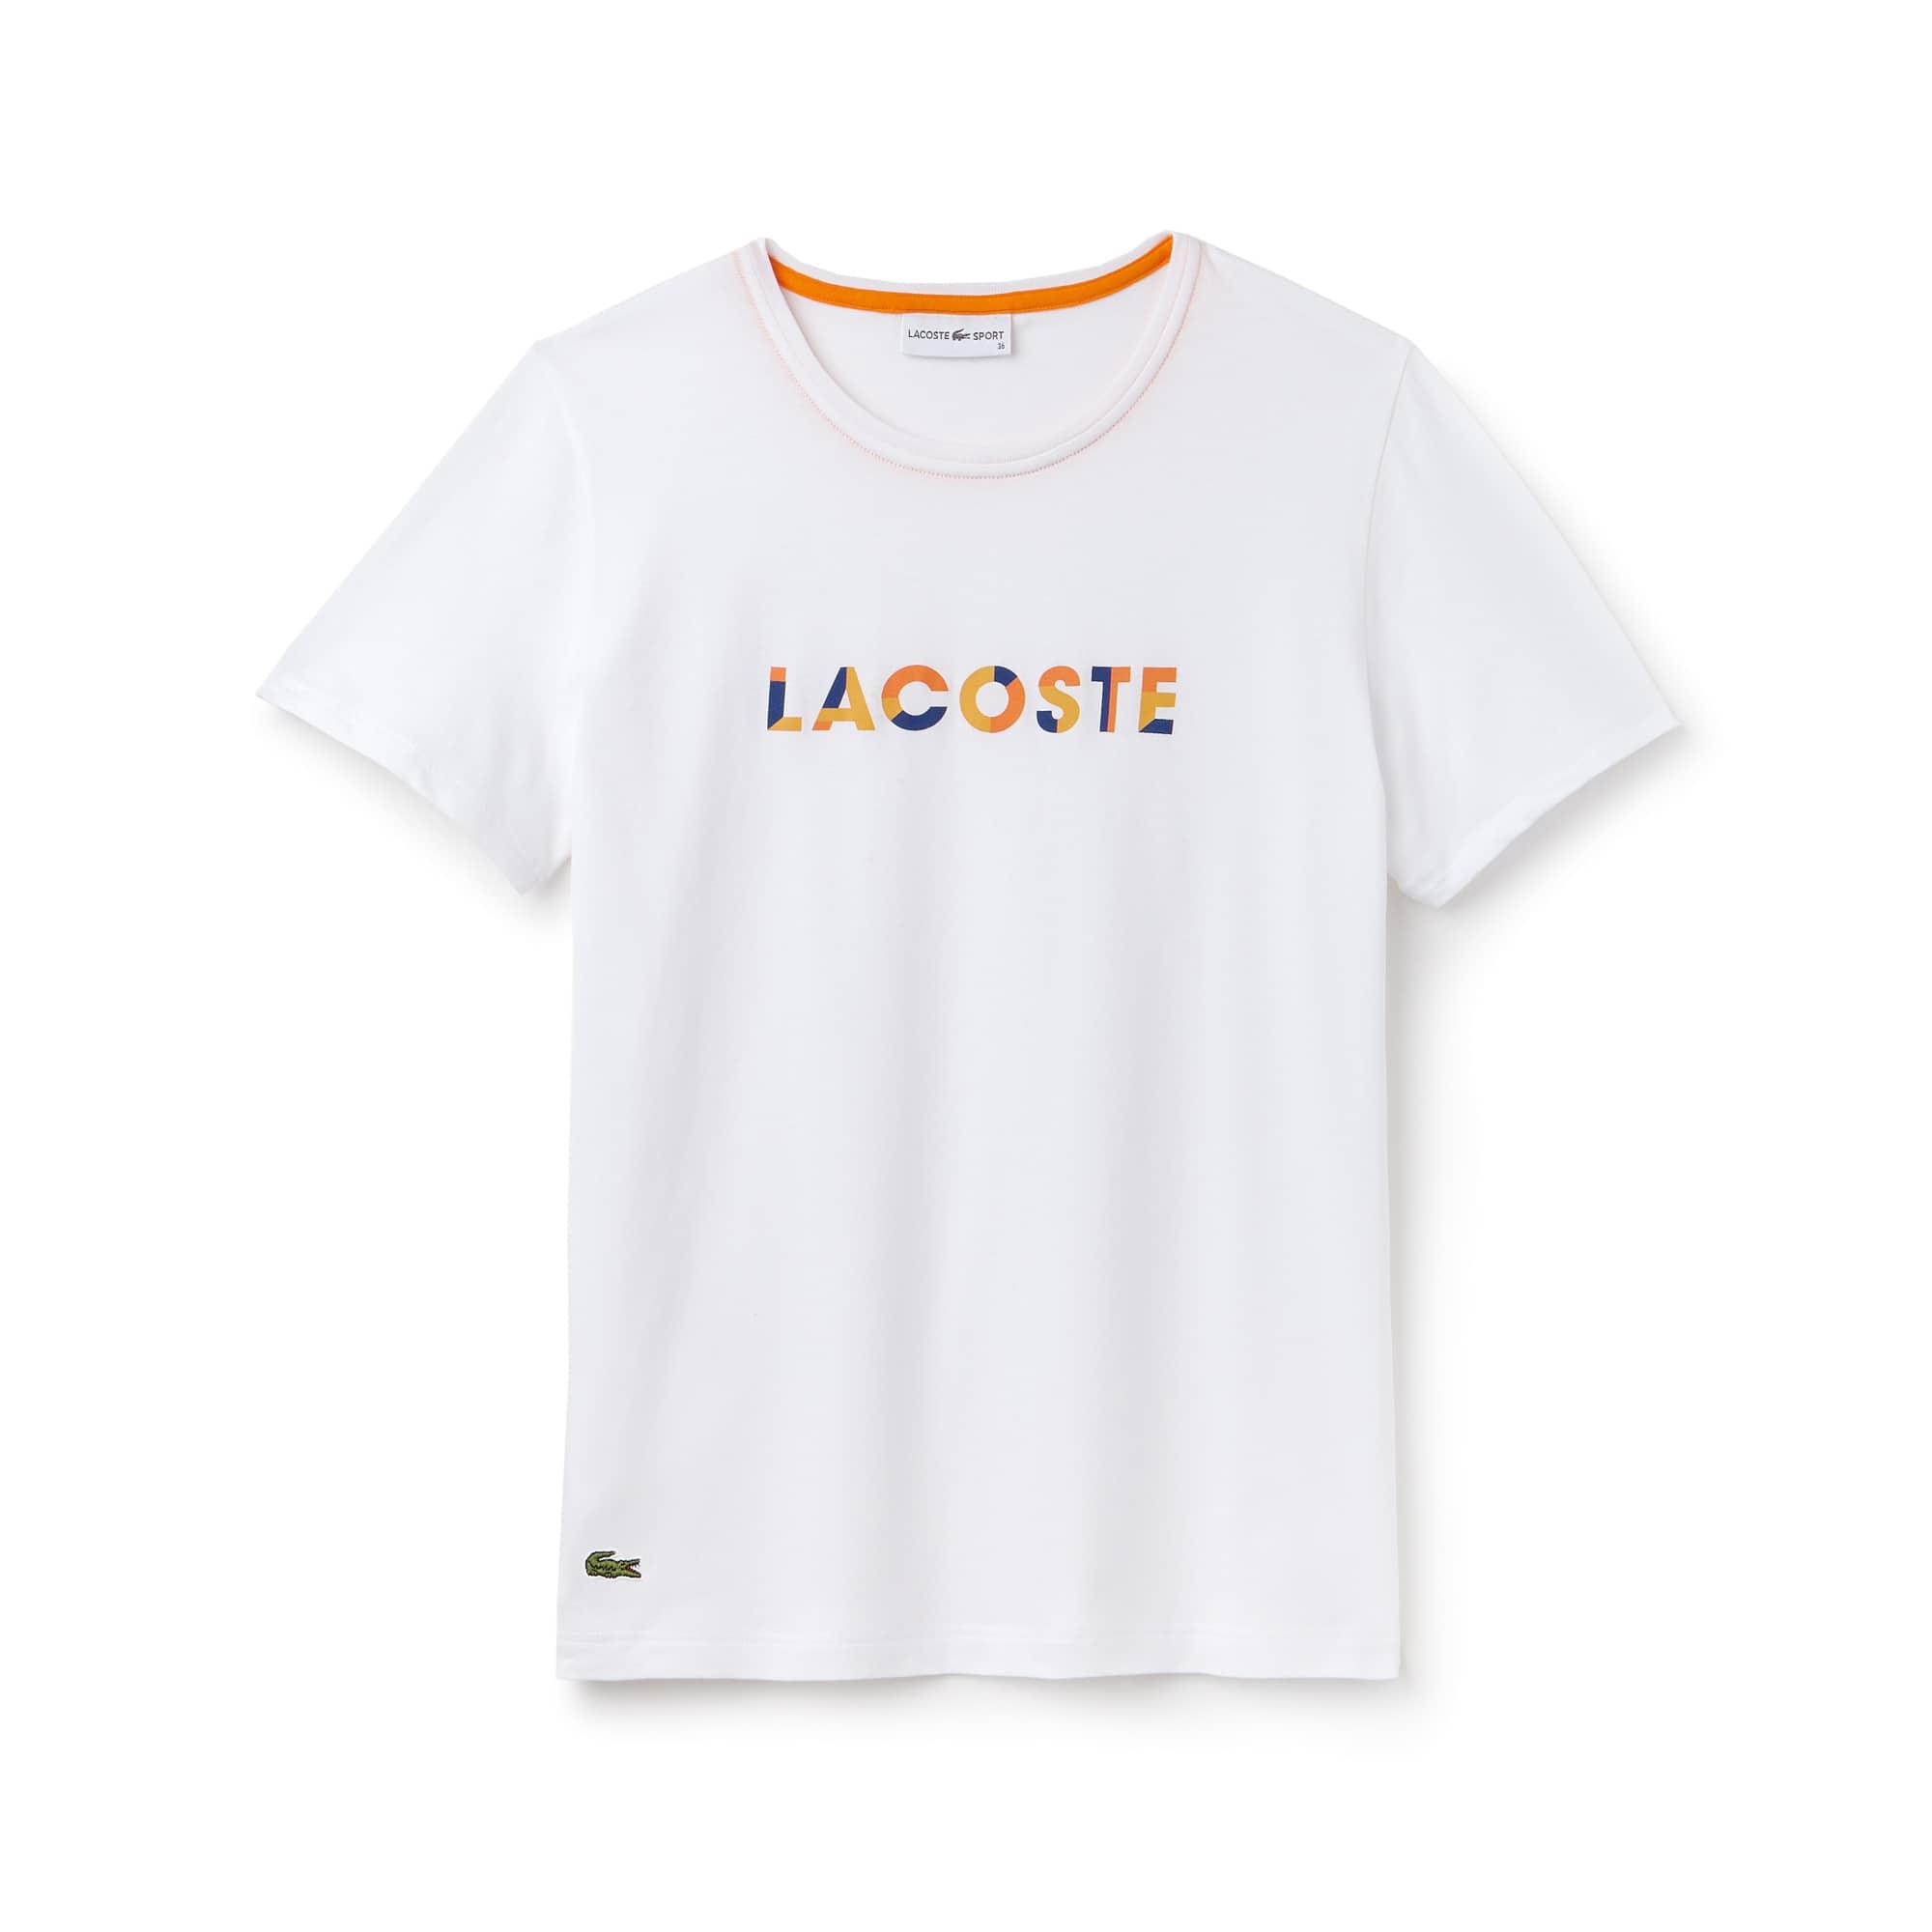 Women's Lacoste SPORT Crew Neck Logo Jersey Tennis T-shirt